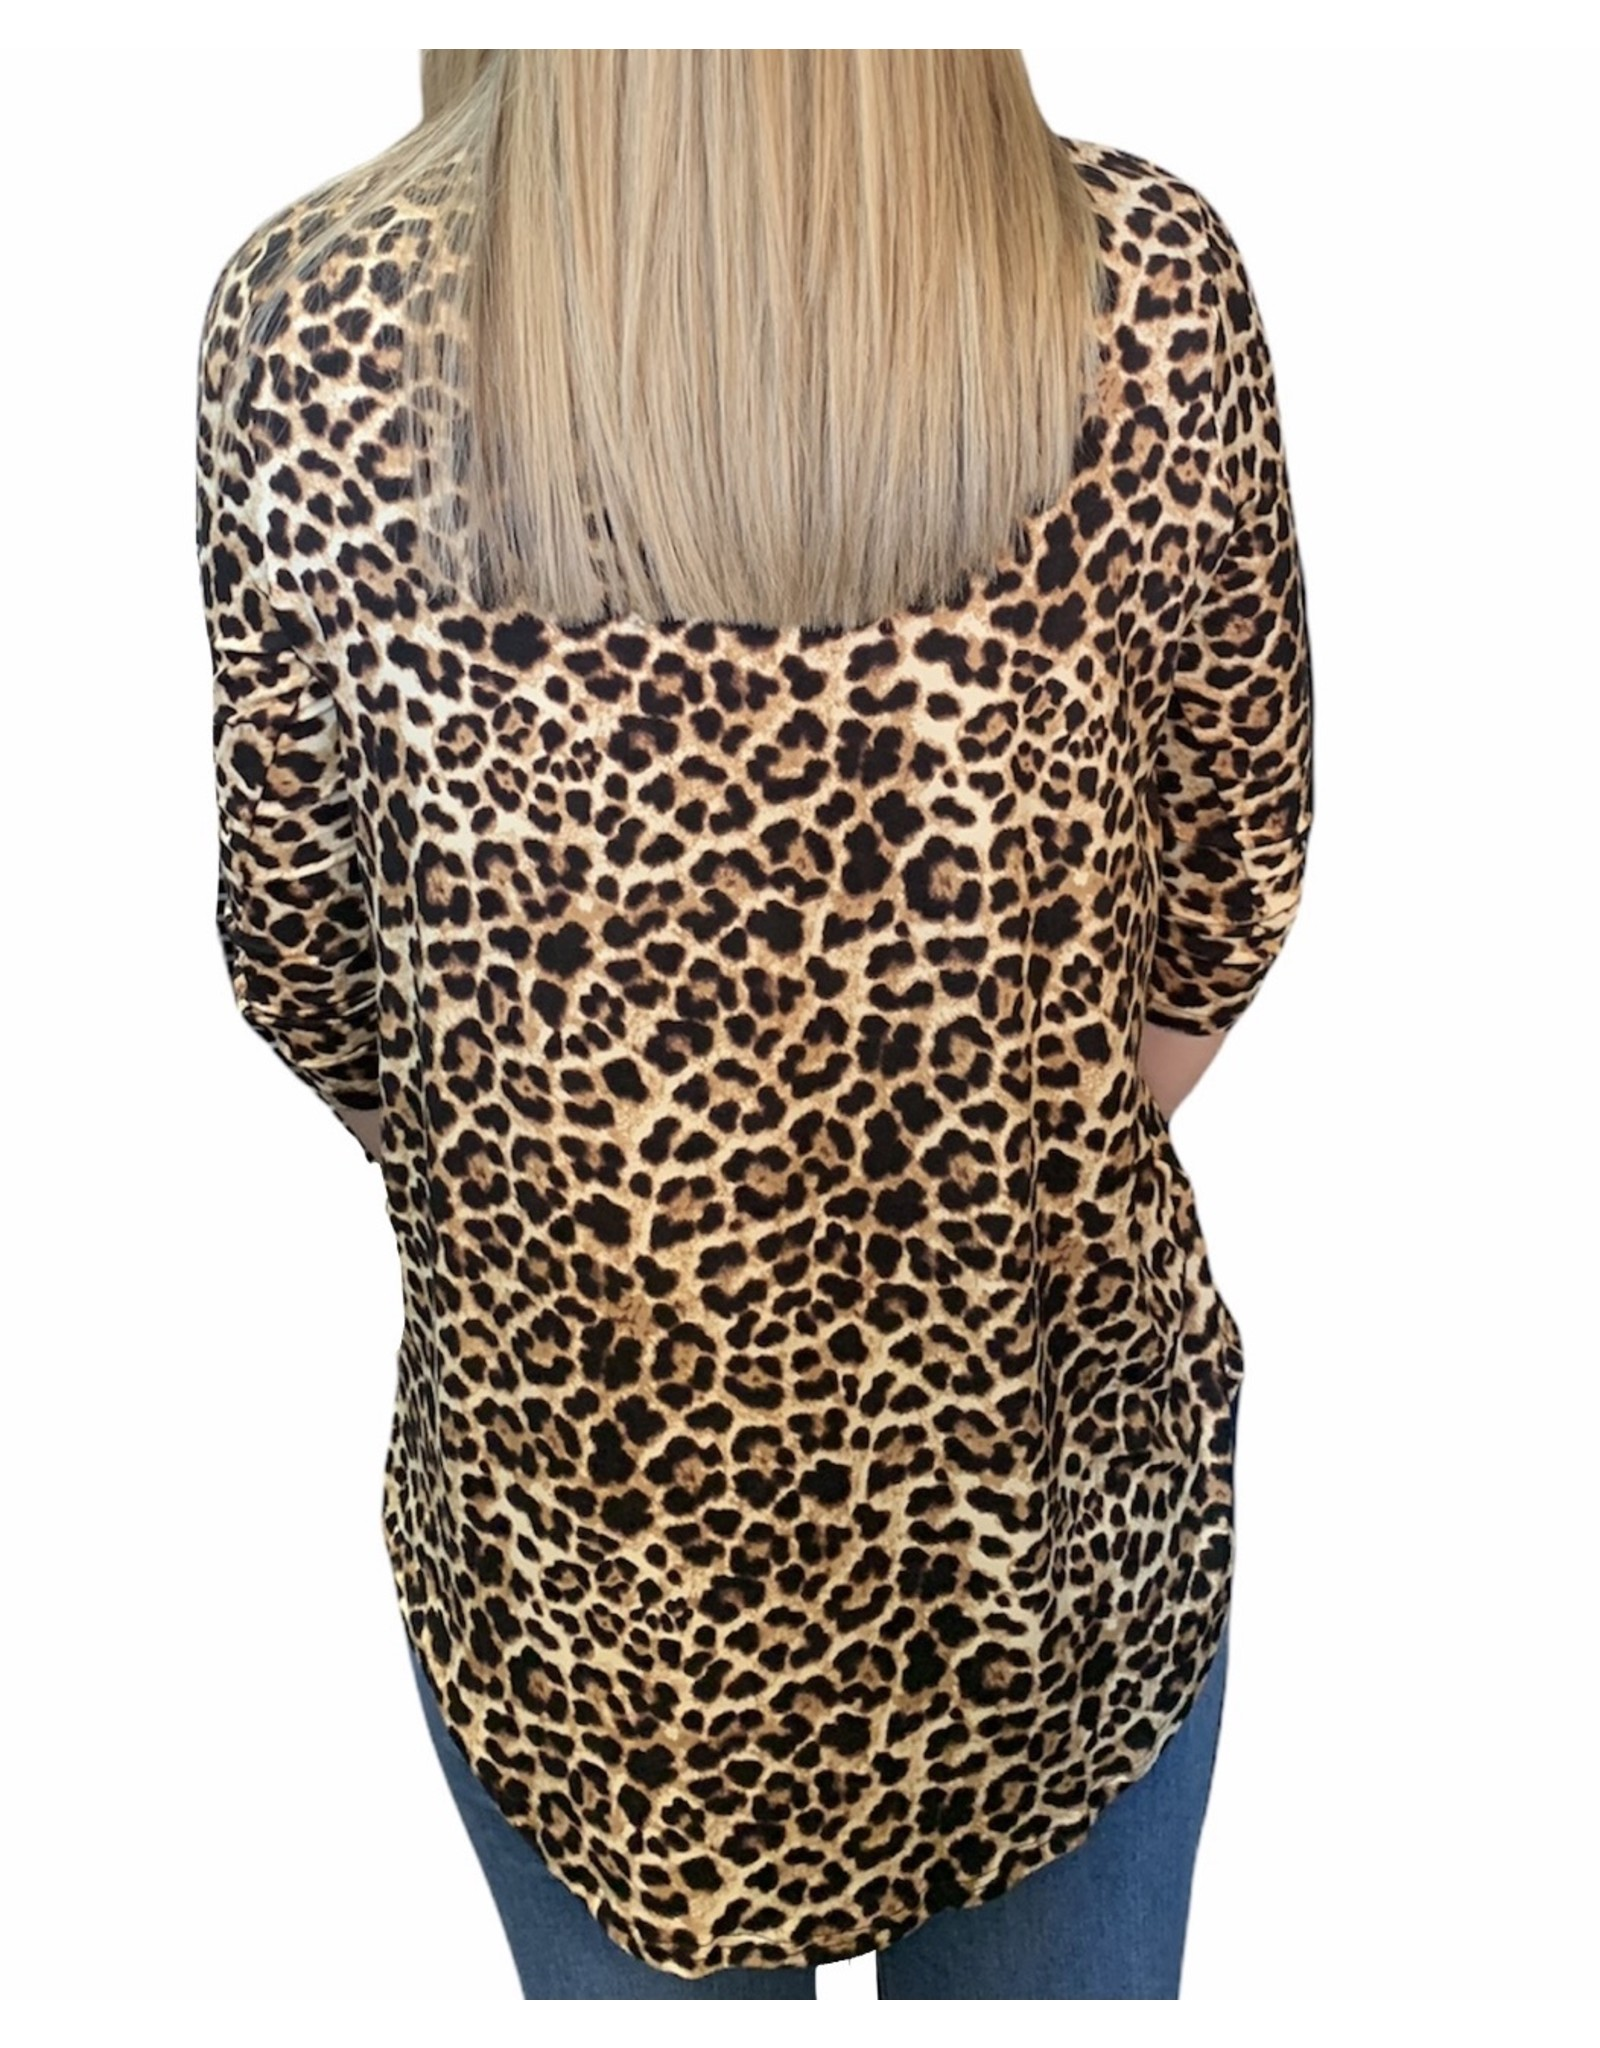 LATA Cheetah Love 3/4 Sleeve V-Neck